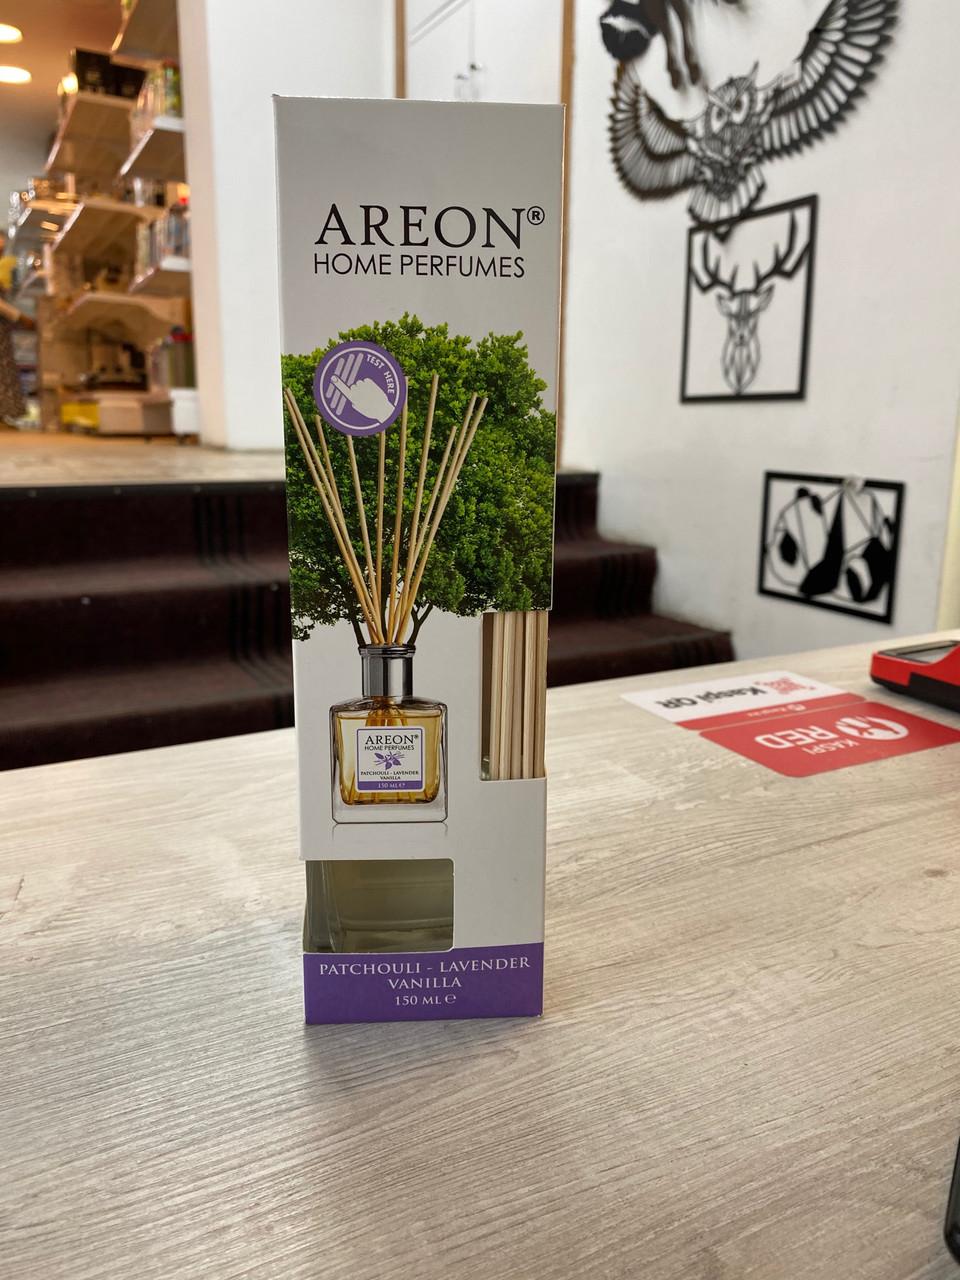 Areon ароматизатор для дома 150 мл Patchouli Lavender Vanilla